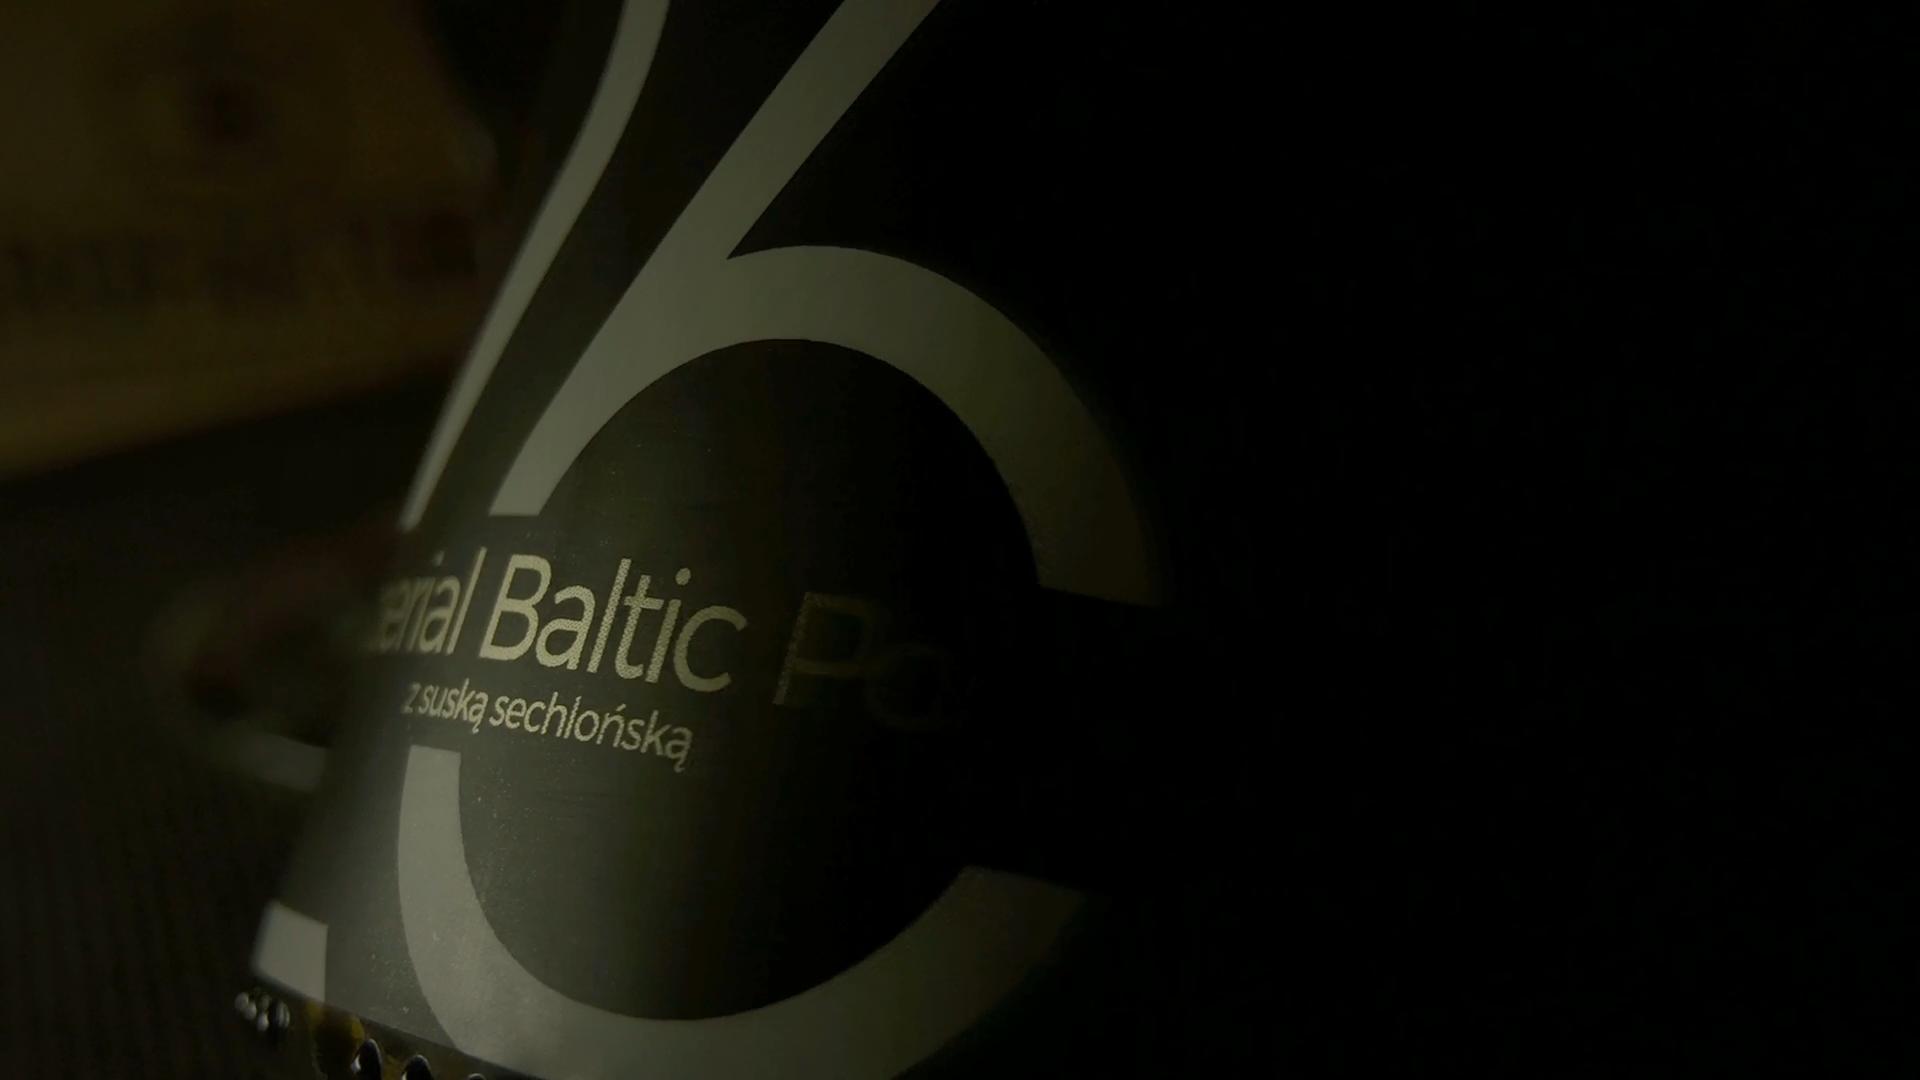 Imperial Baltic Porter - Brofaktura 2019